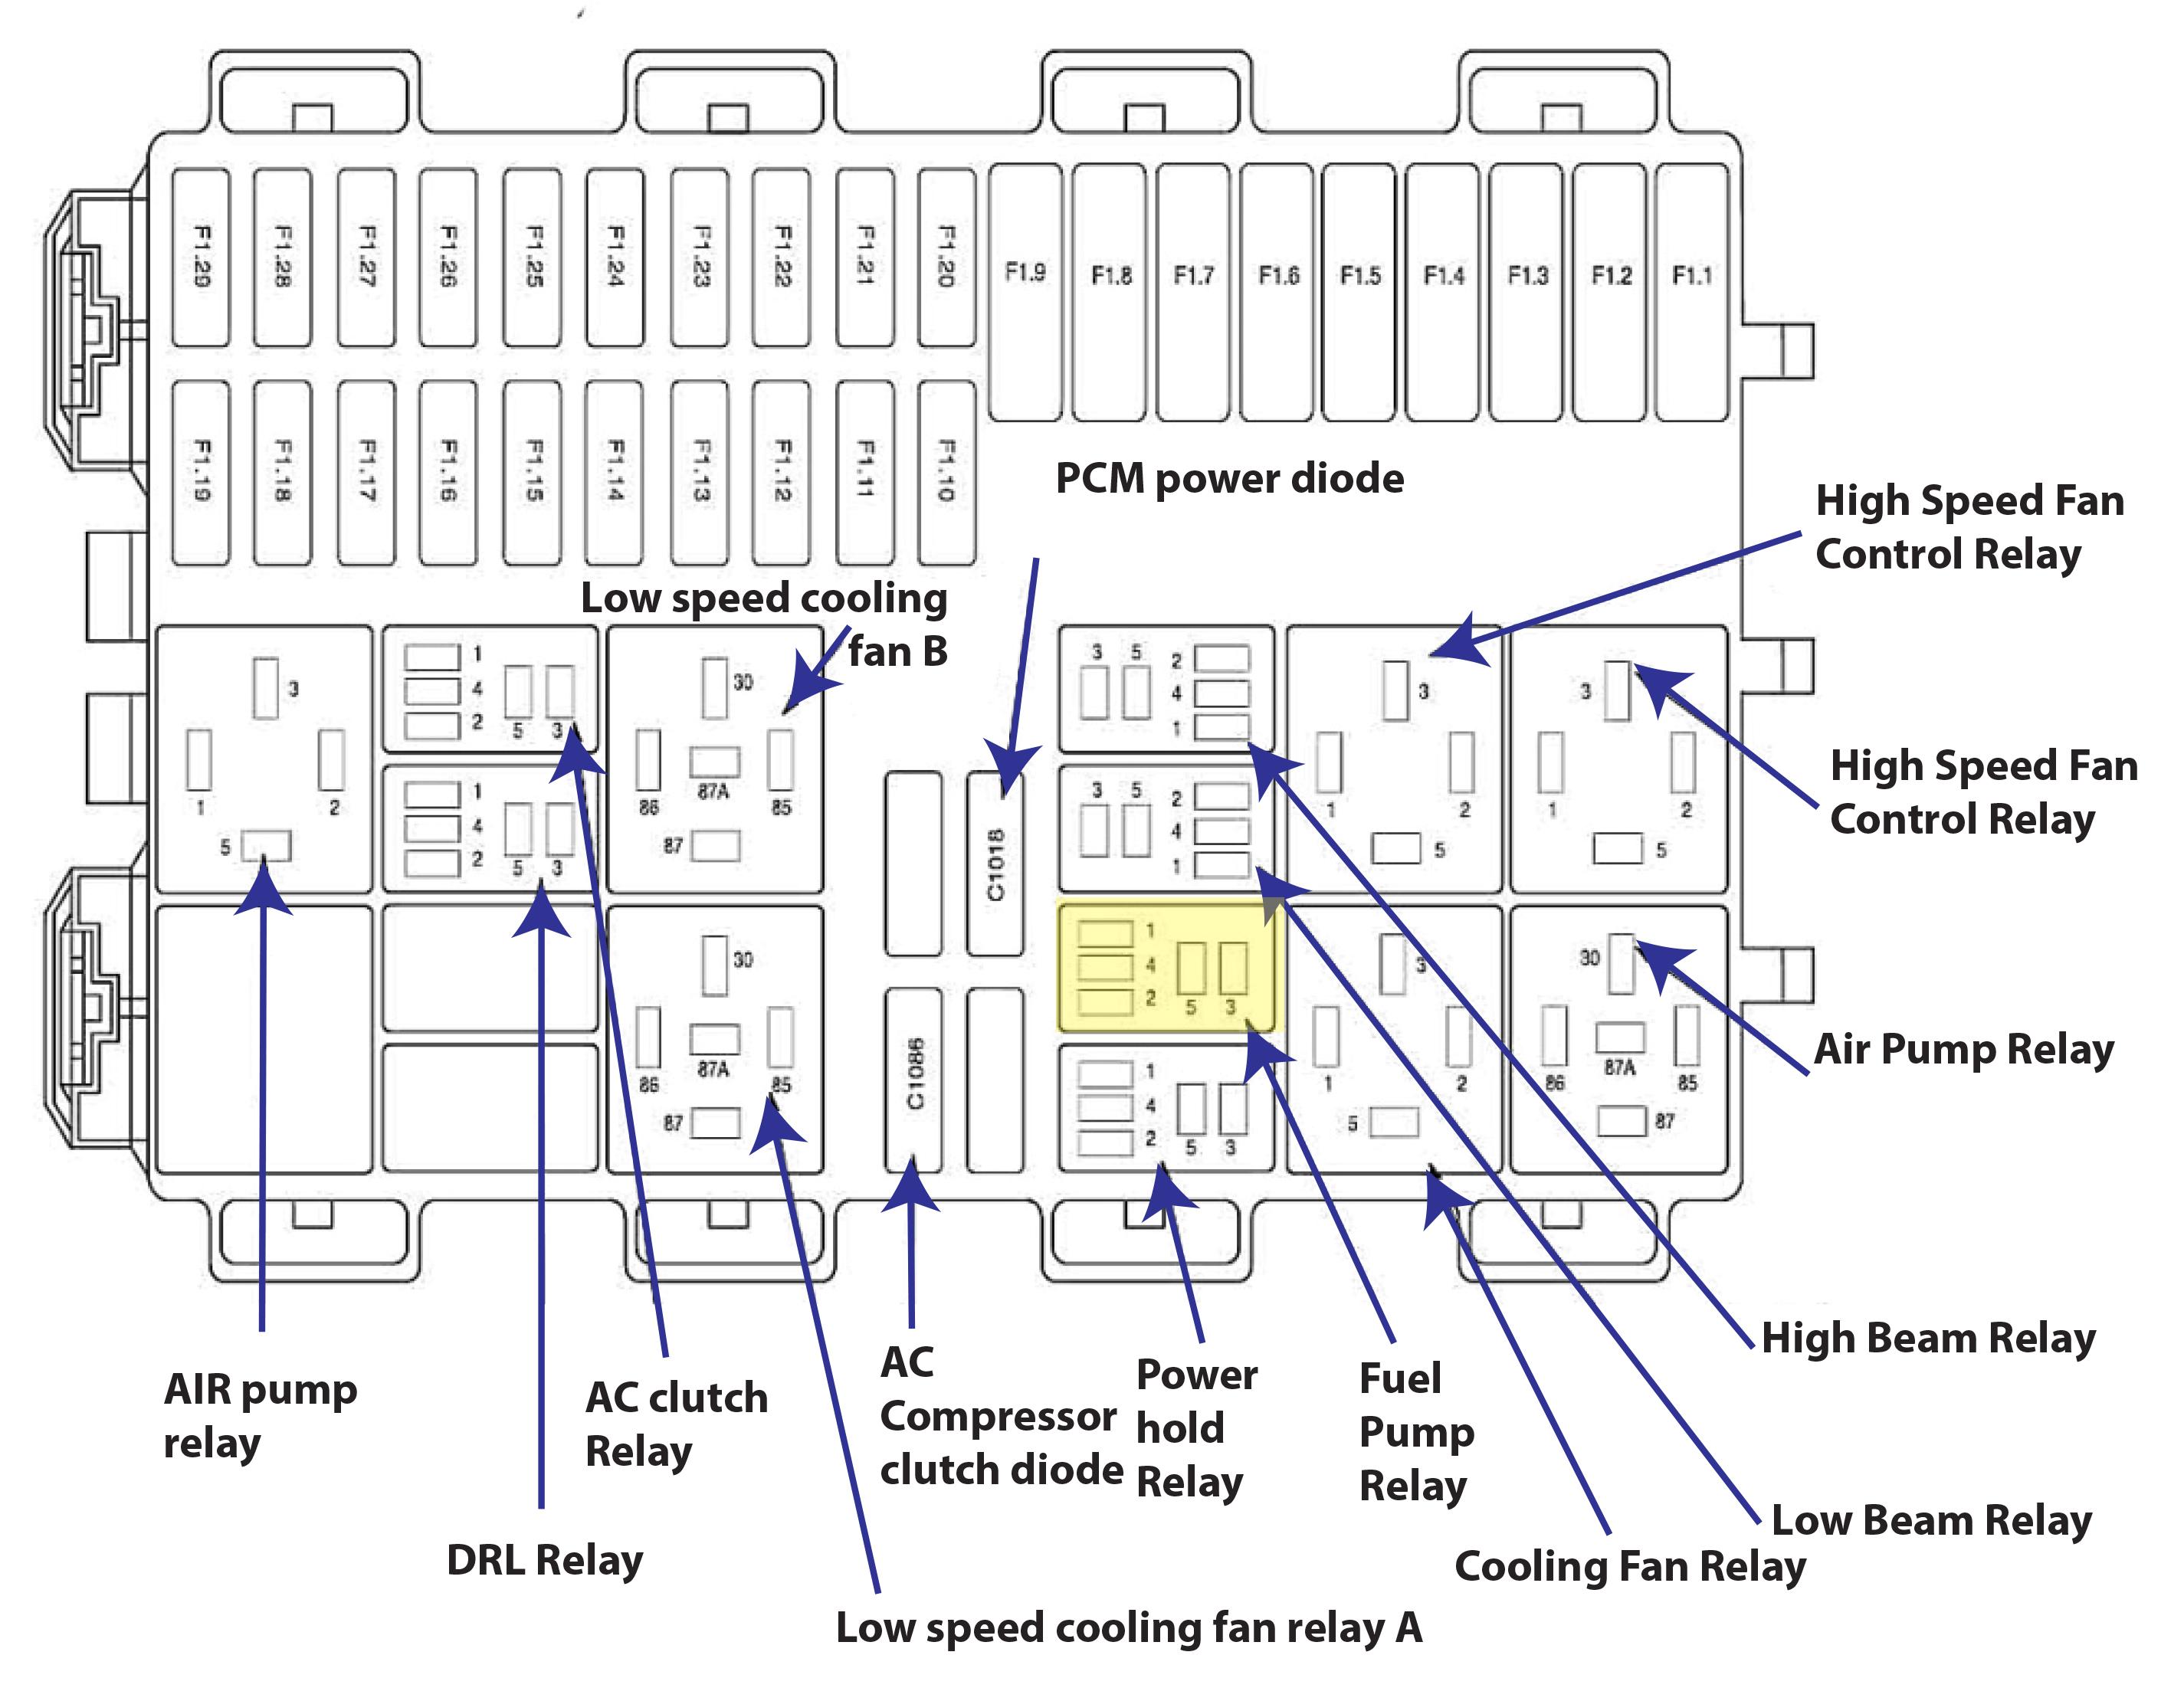 2003 ford focus fuse box diagram wiring schematic wiring diagram today 2003 ford focus fuse box diagram wiring schematic